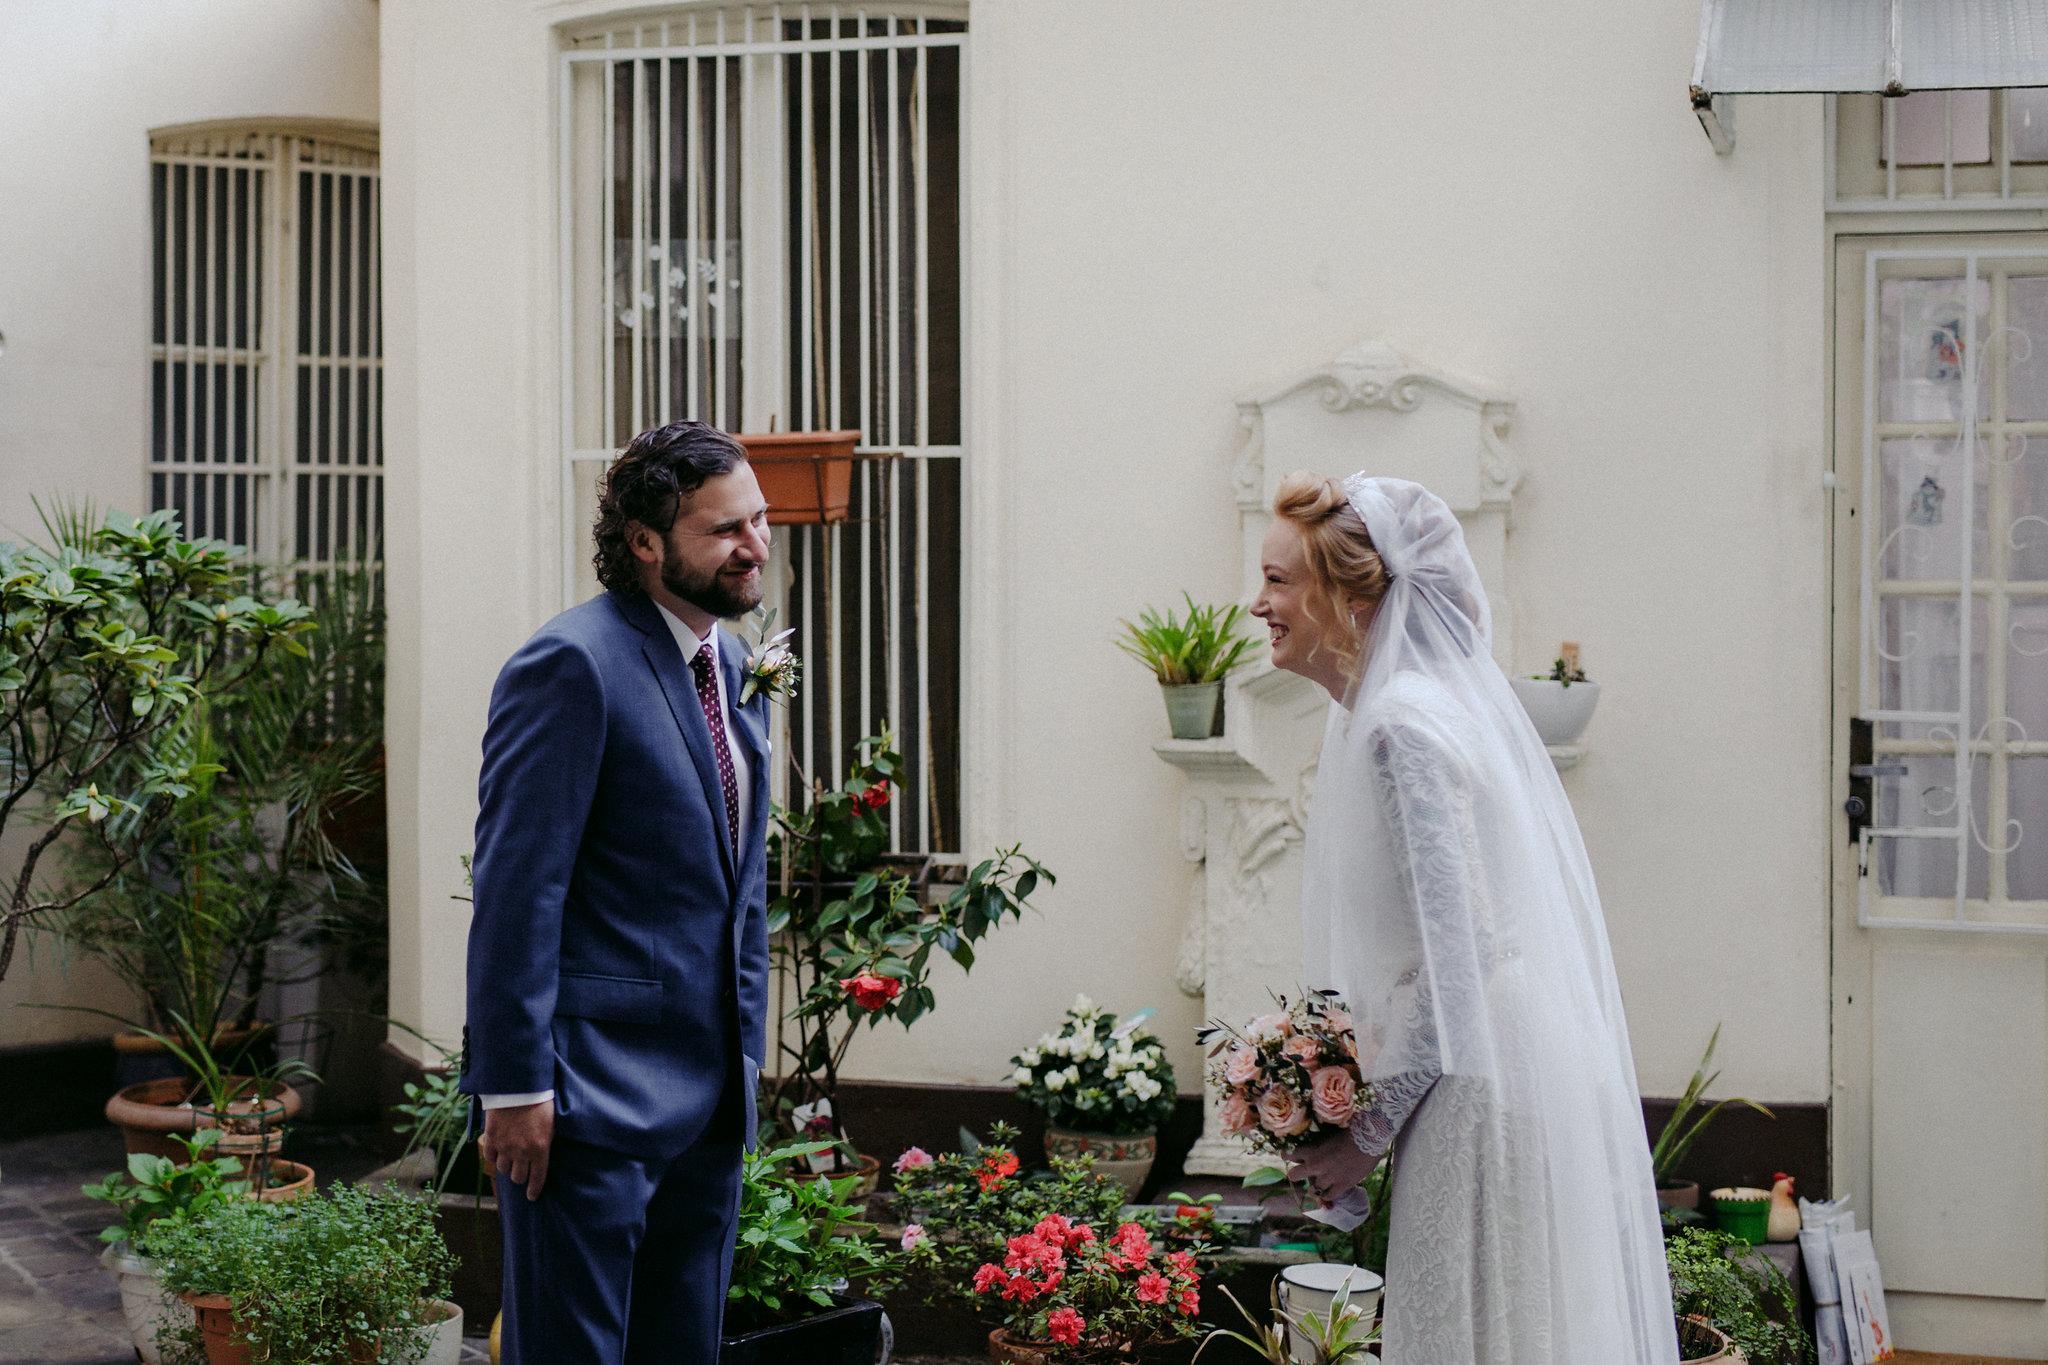 Paris_elopement_wedding_photographer-61.jpg